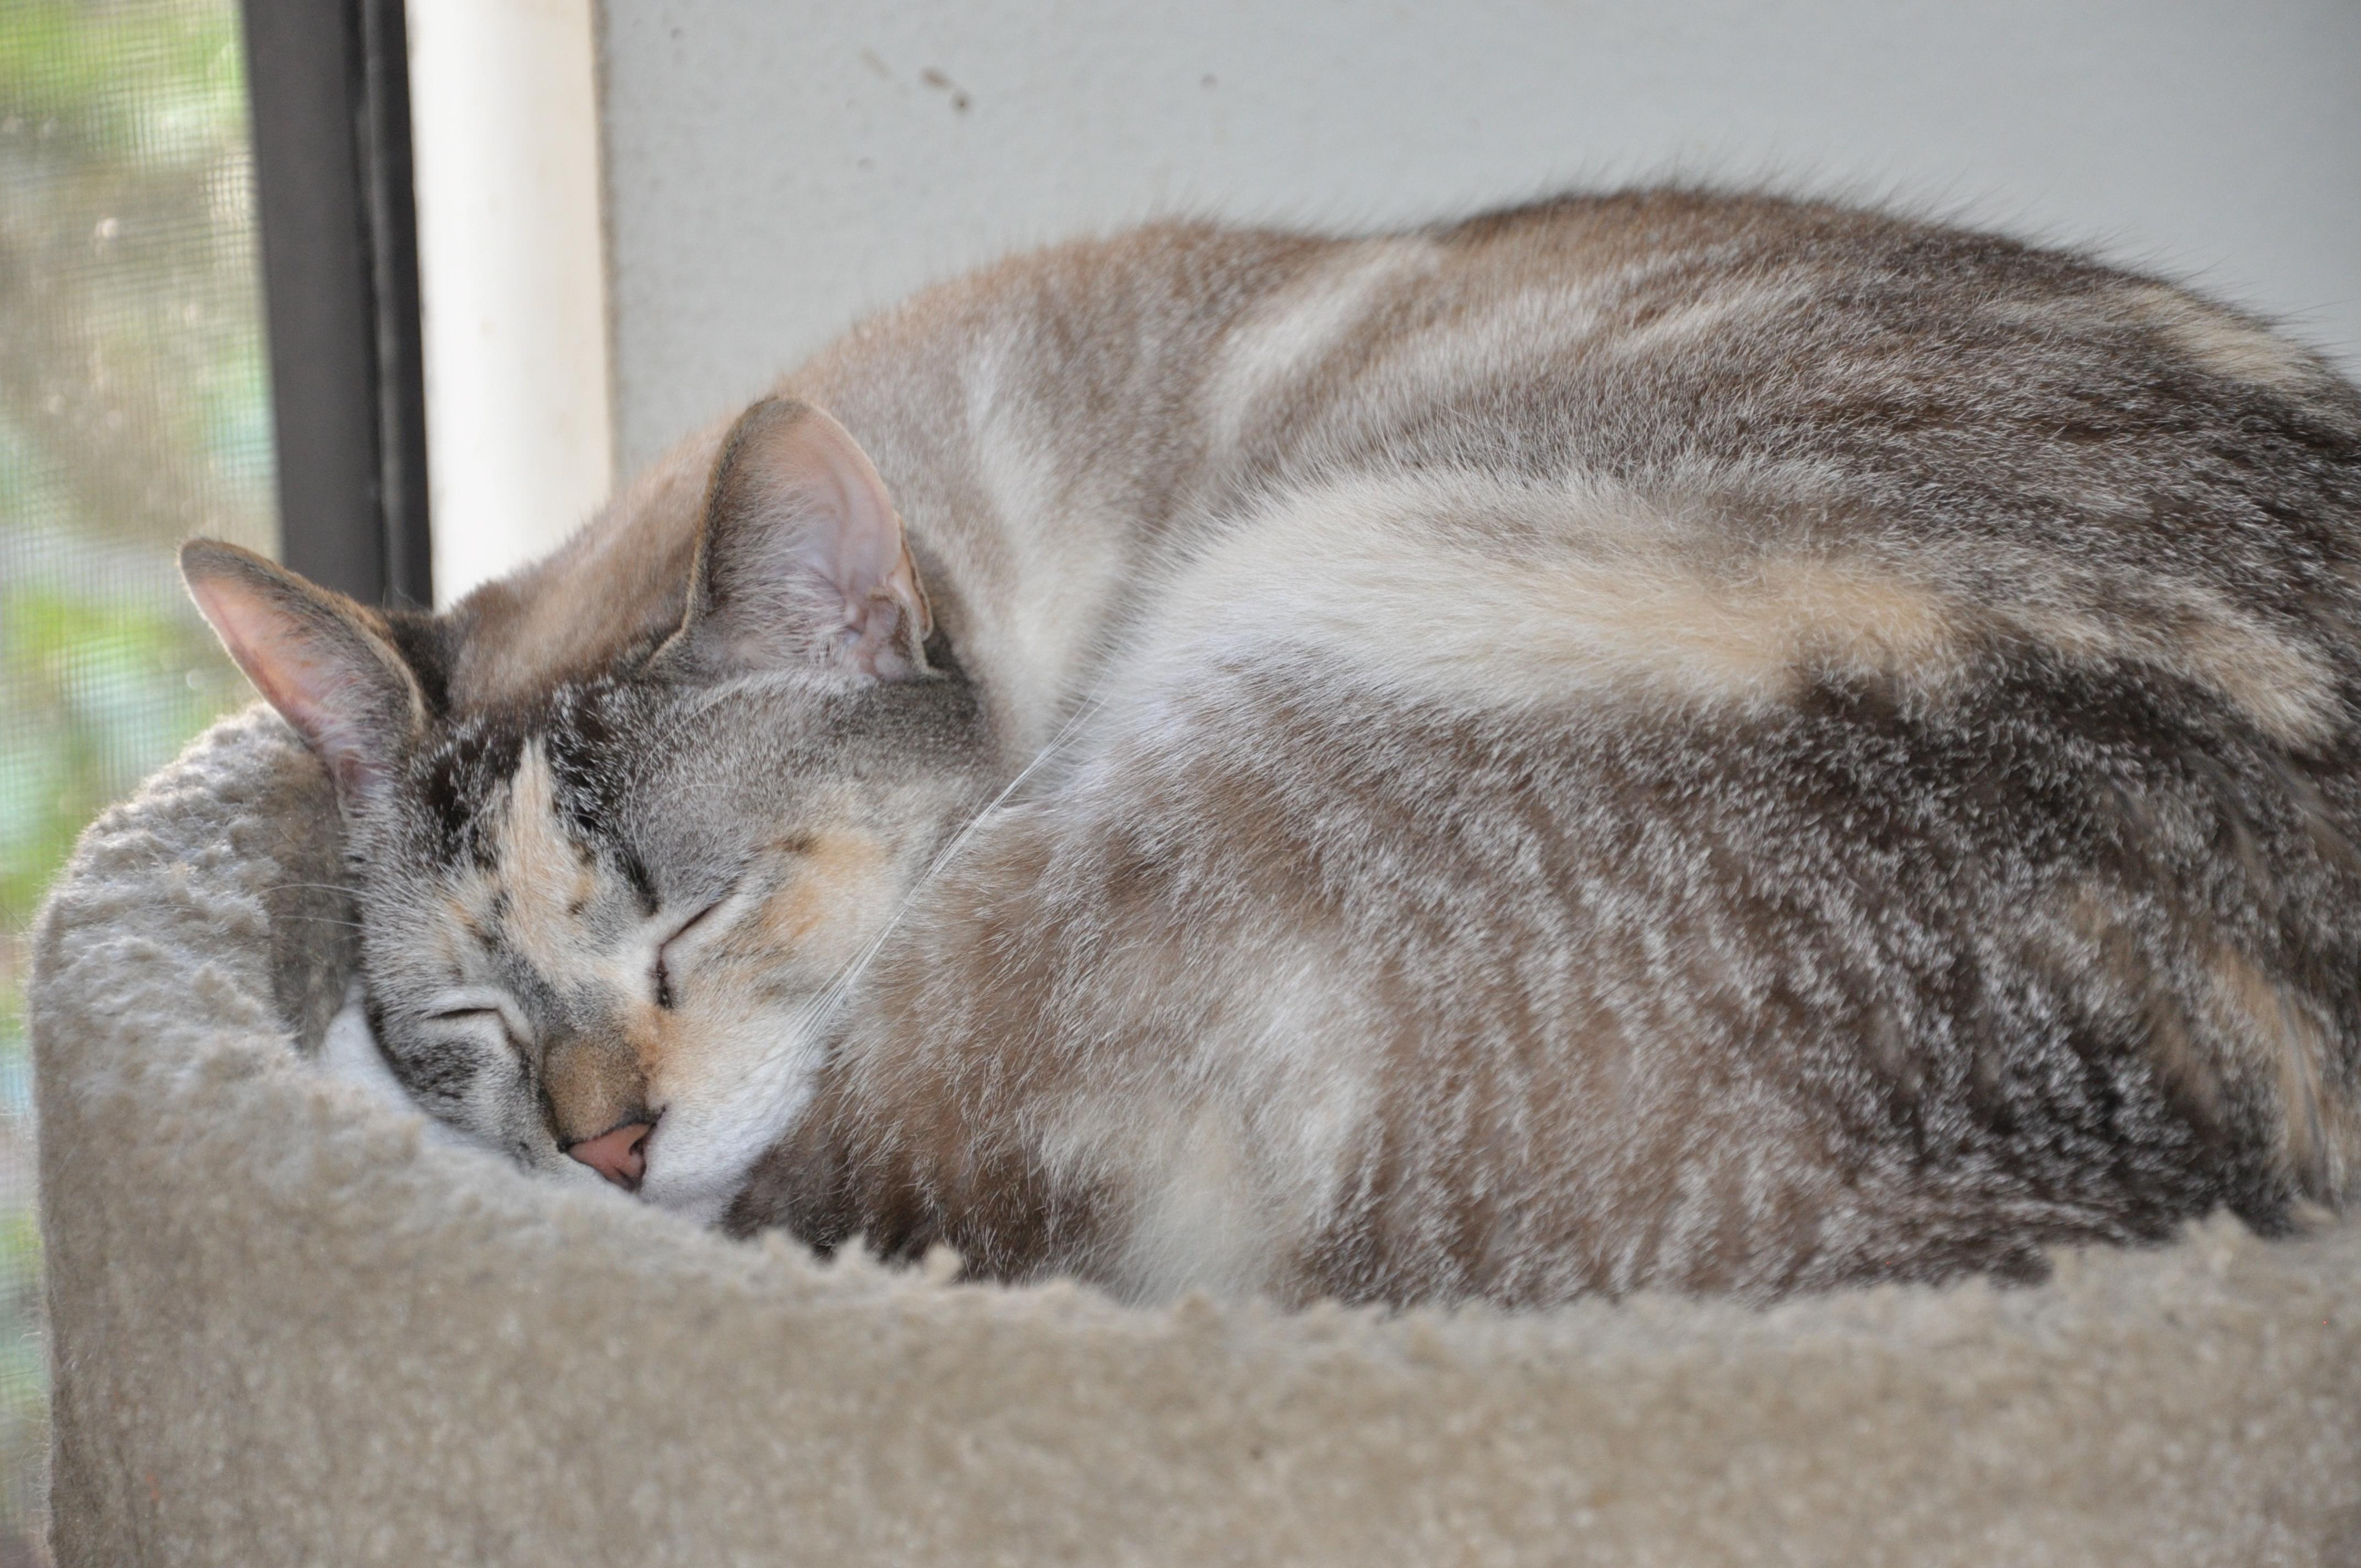 Wordless Wednesday - Sleeping Cats